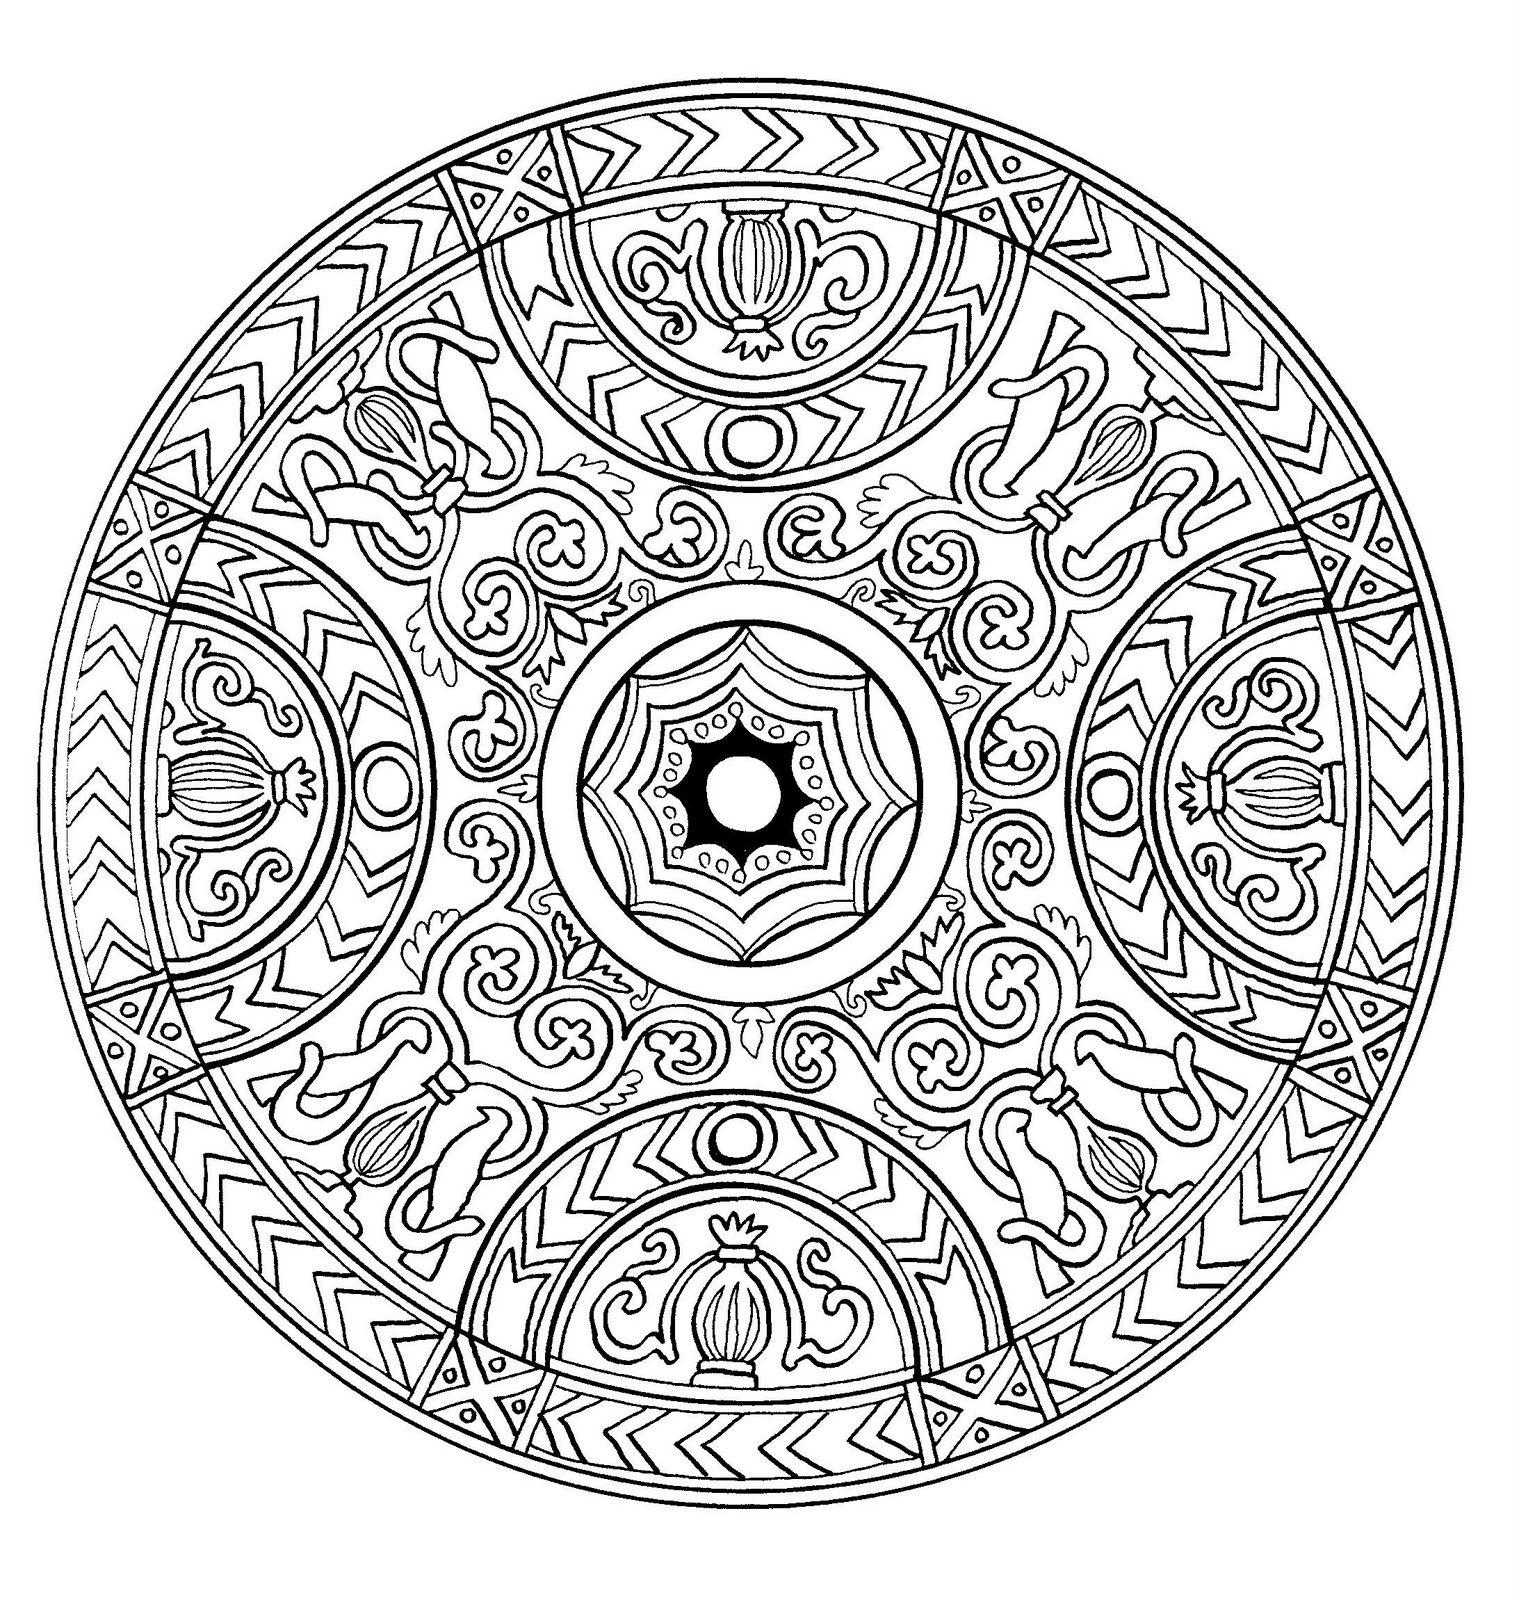 Free Mandalas page «mandala-to-color-zen-relax-free (14 ...